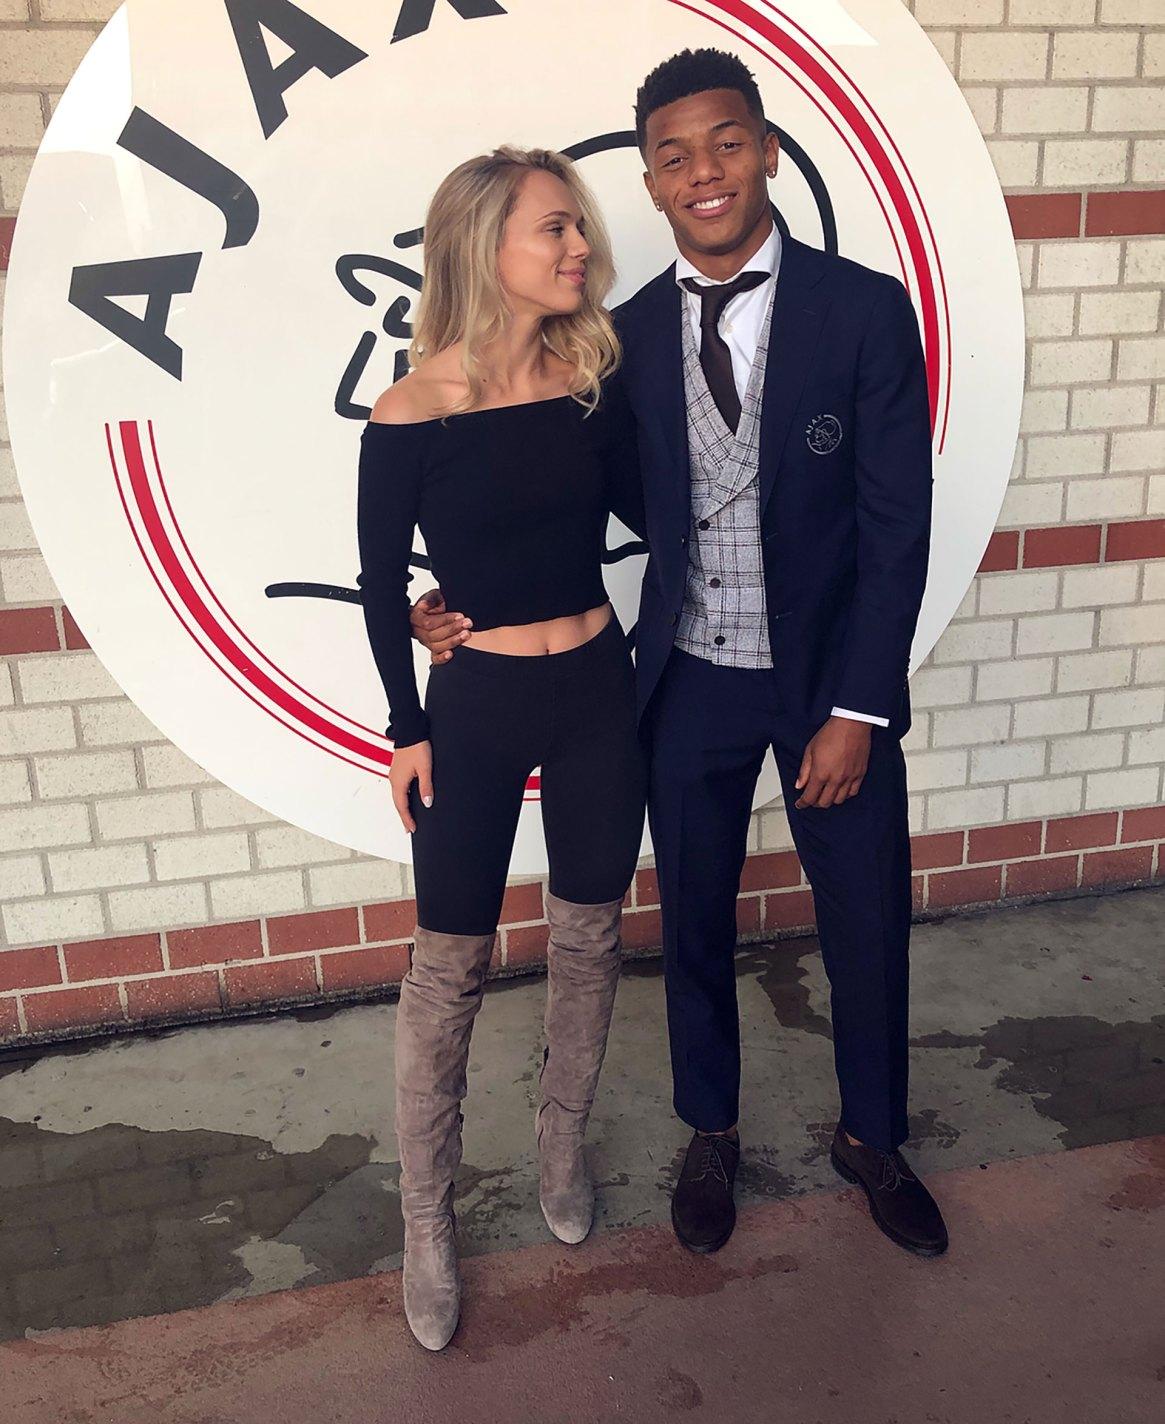 El futbolista David Neres y la modelo Kira Winona